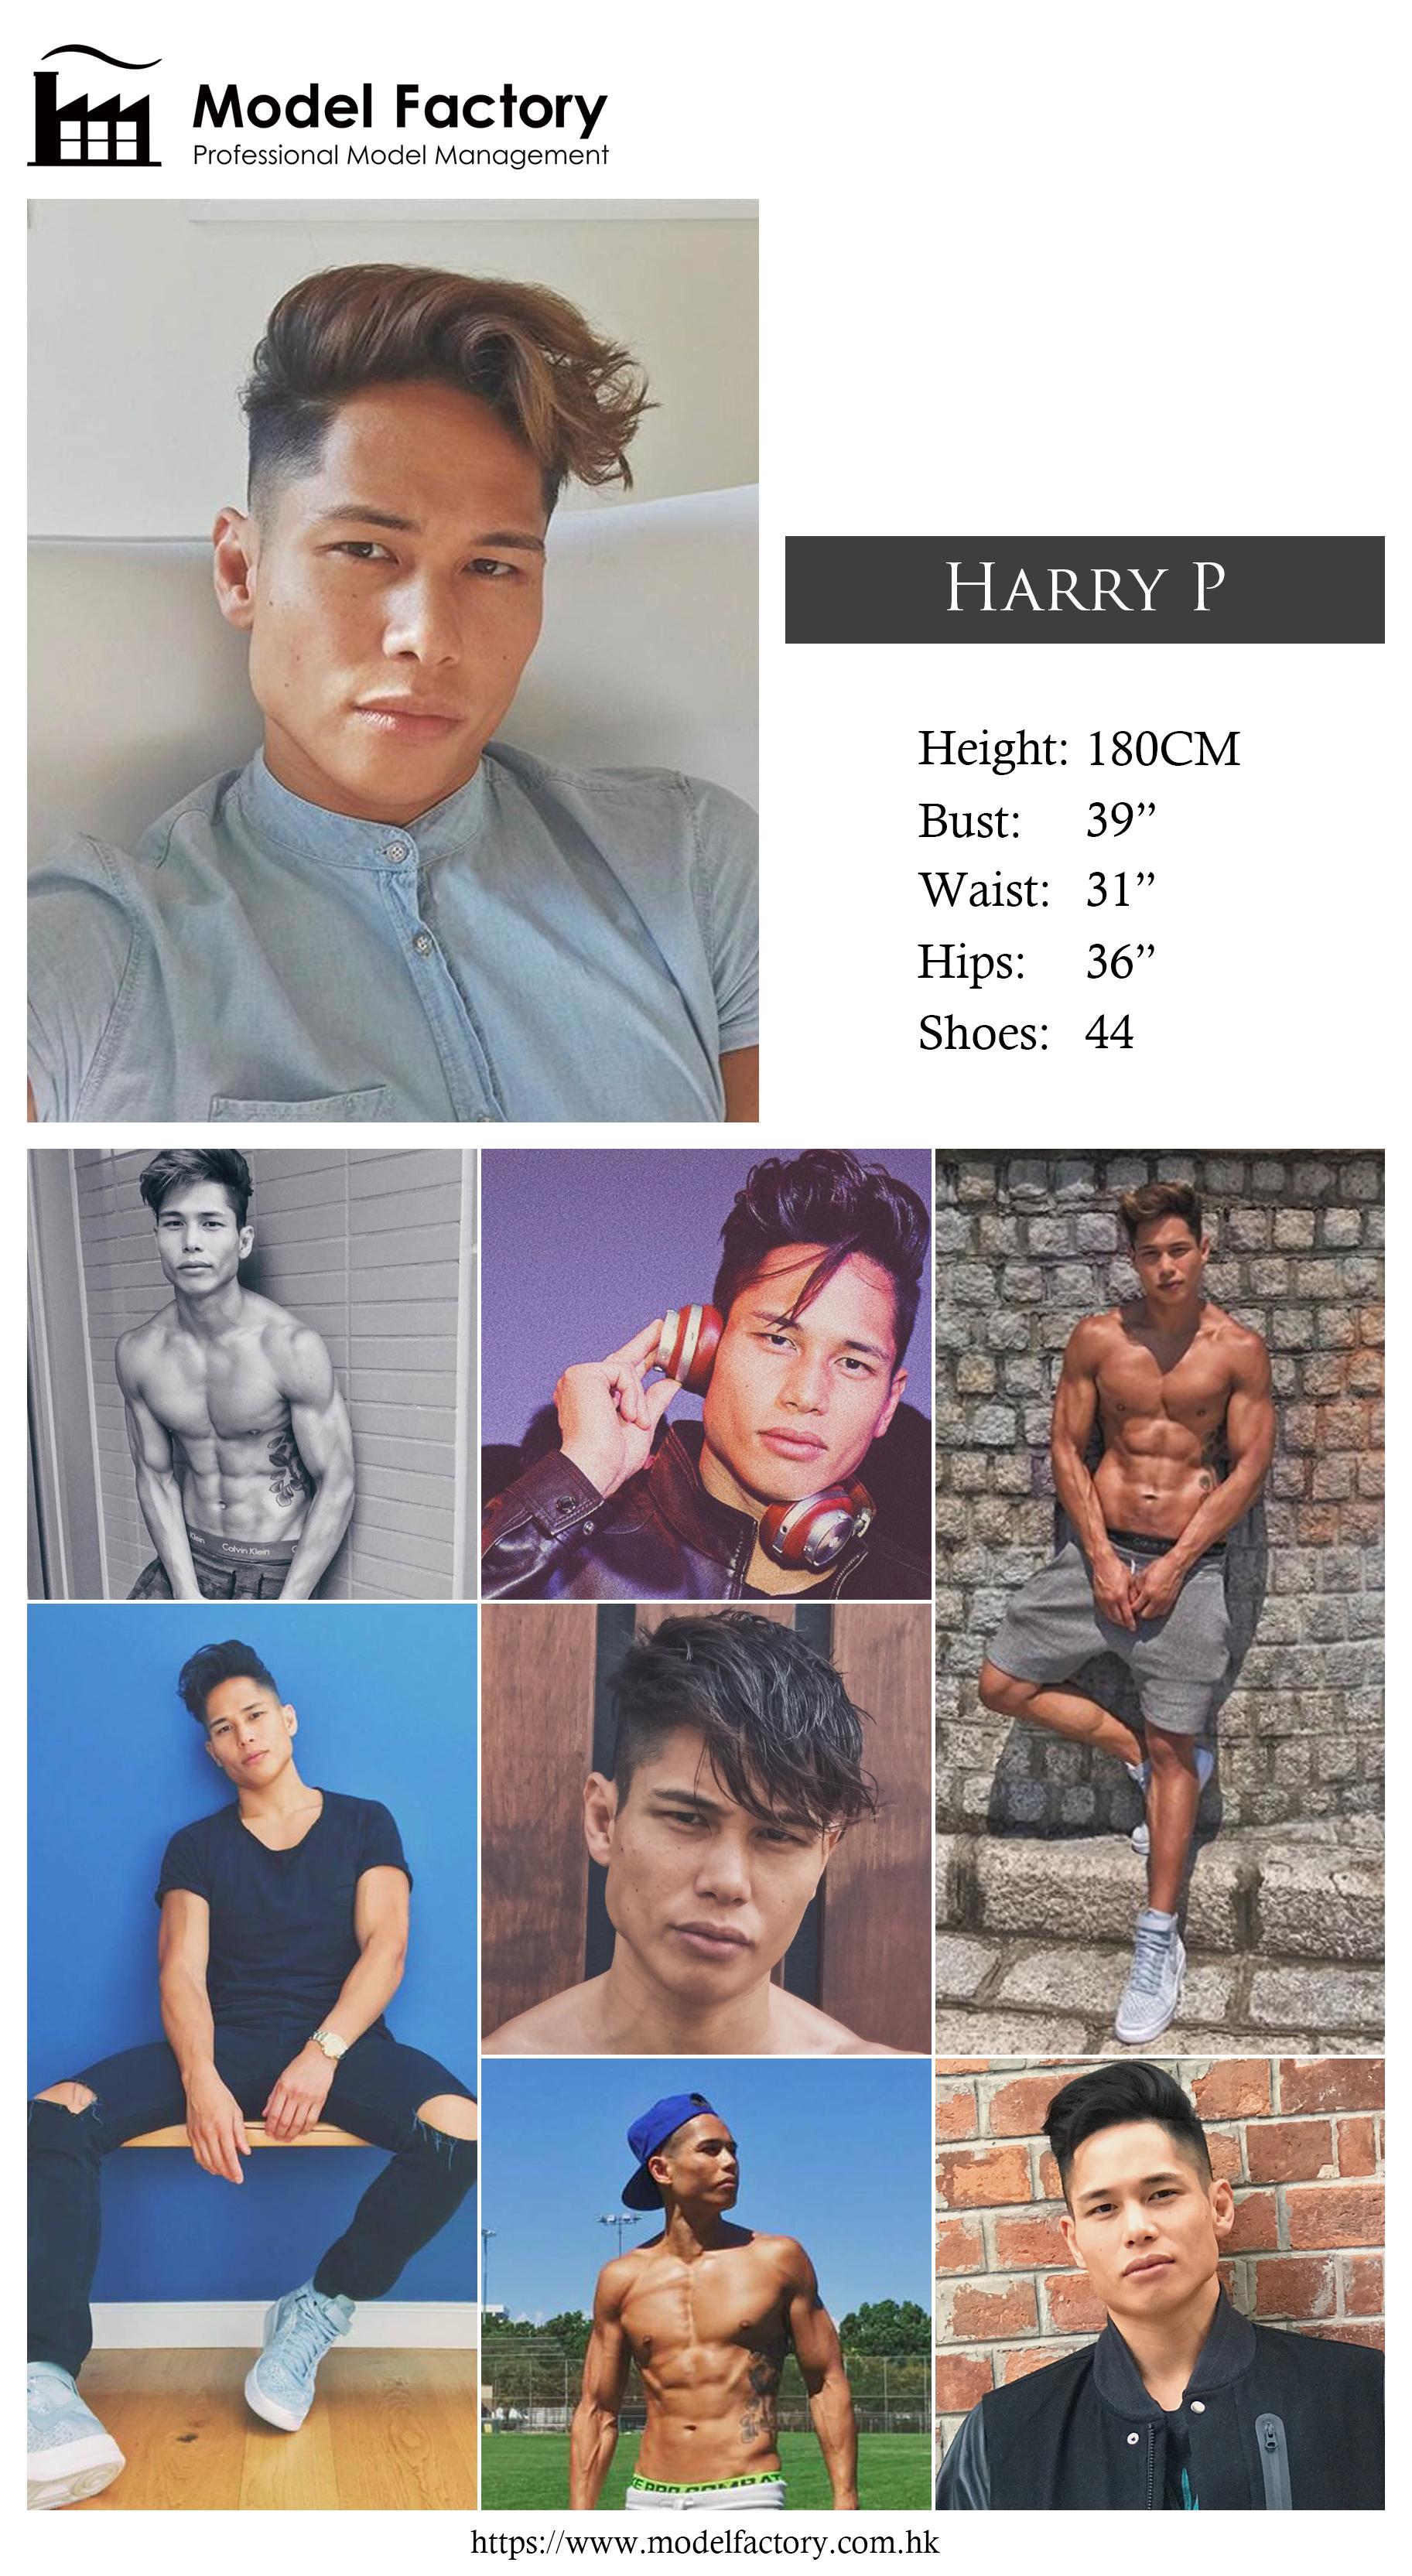 Model Factory Hong Kong Male Model HarryP